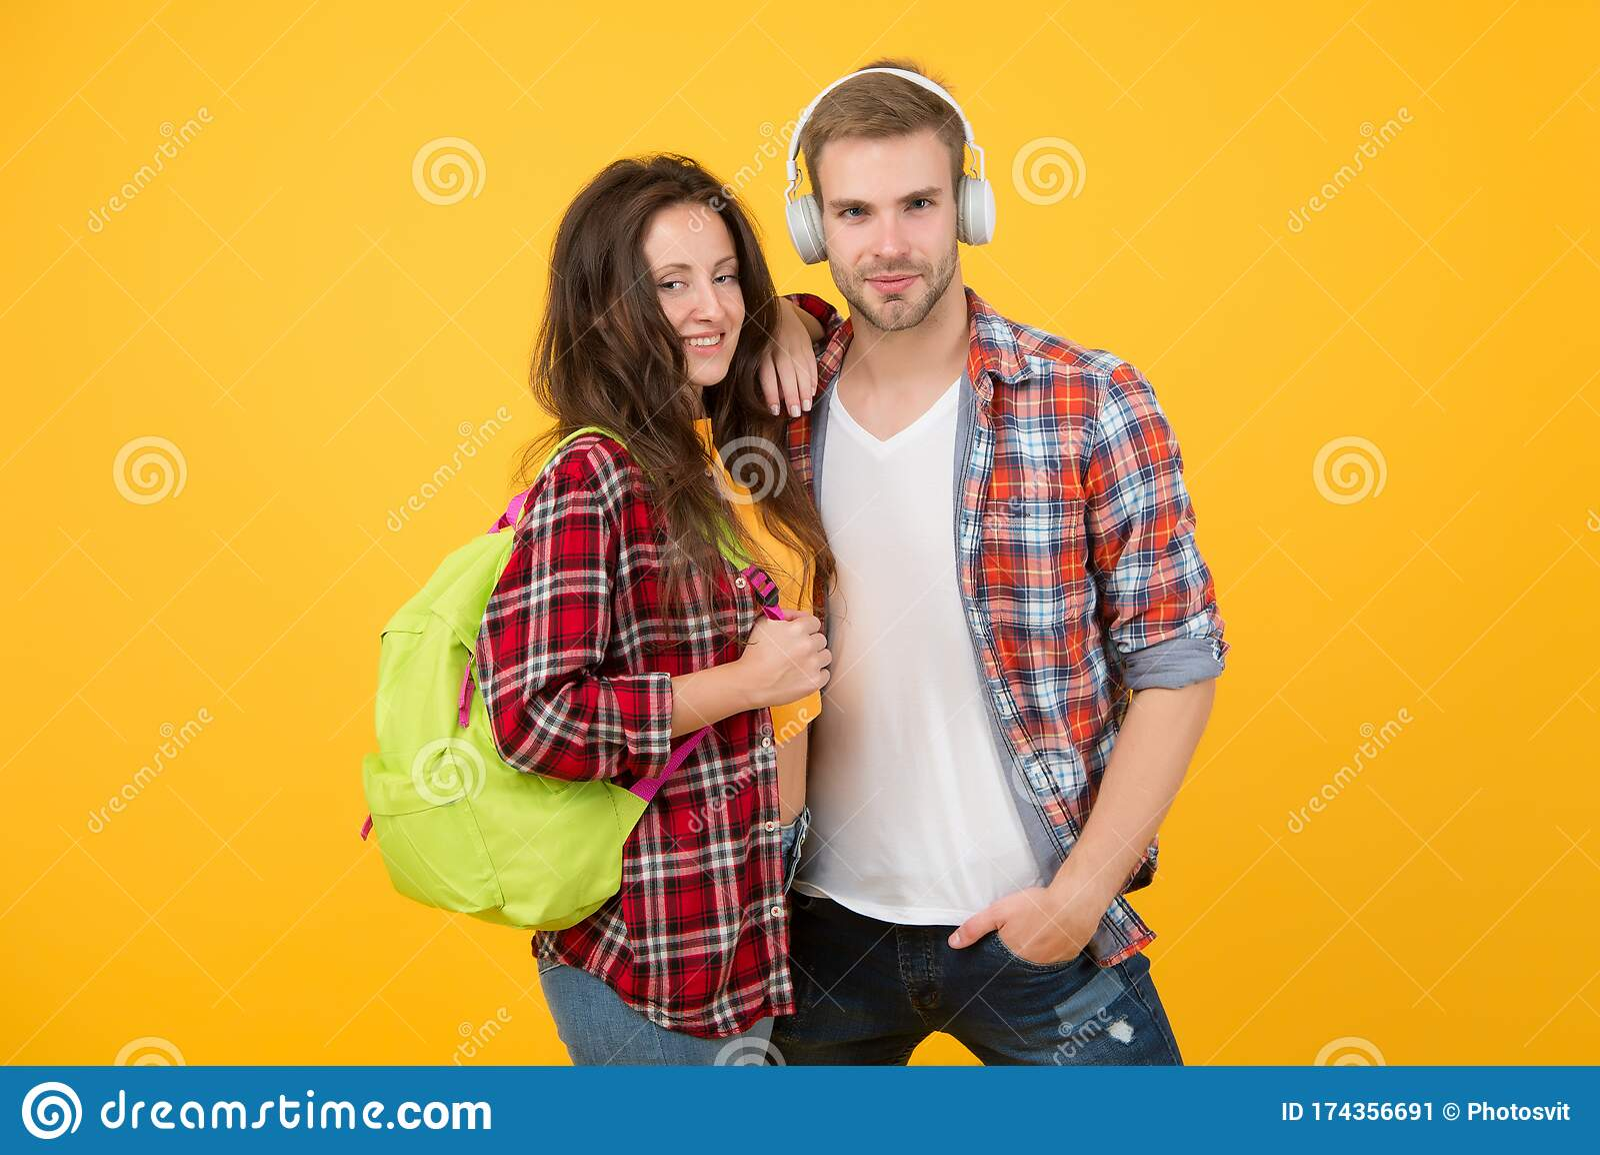 Dating university University Dating: